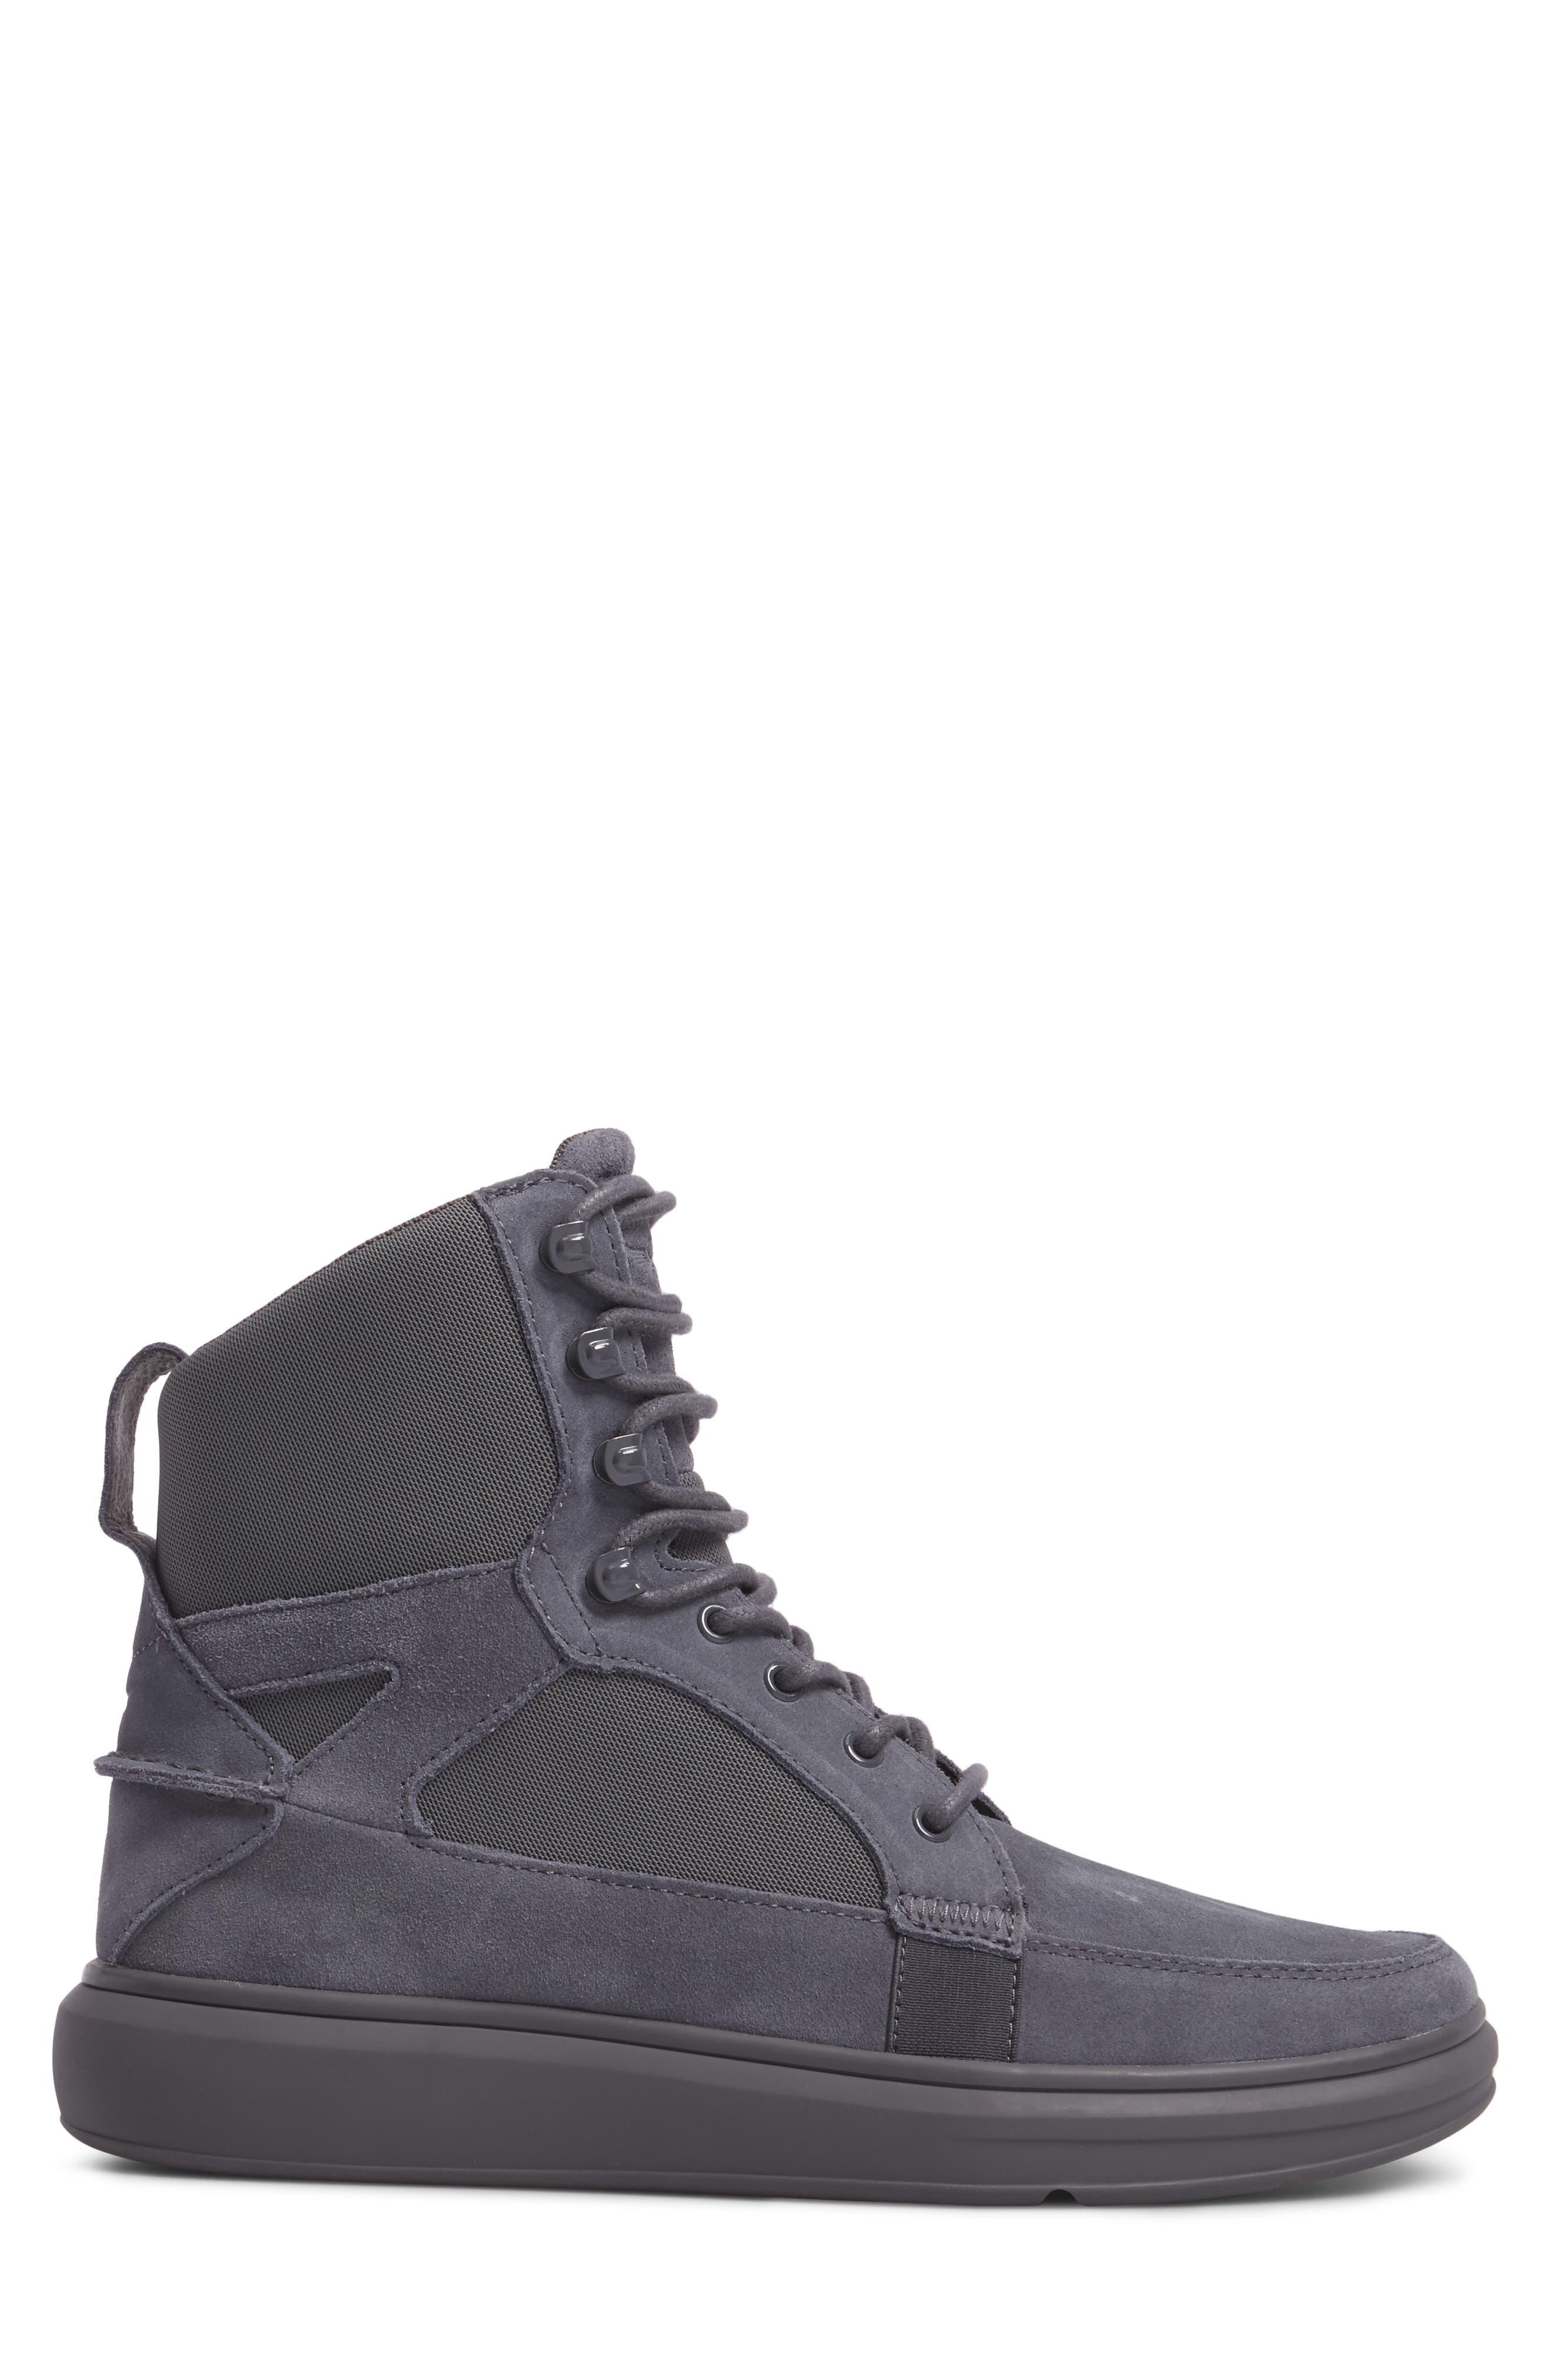 Desimo Sneaker,                             Alternate thumbnail 3, color,                             032